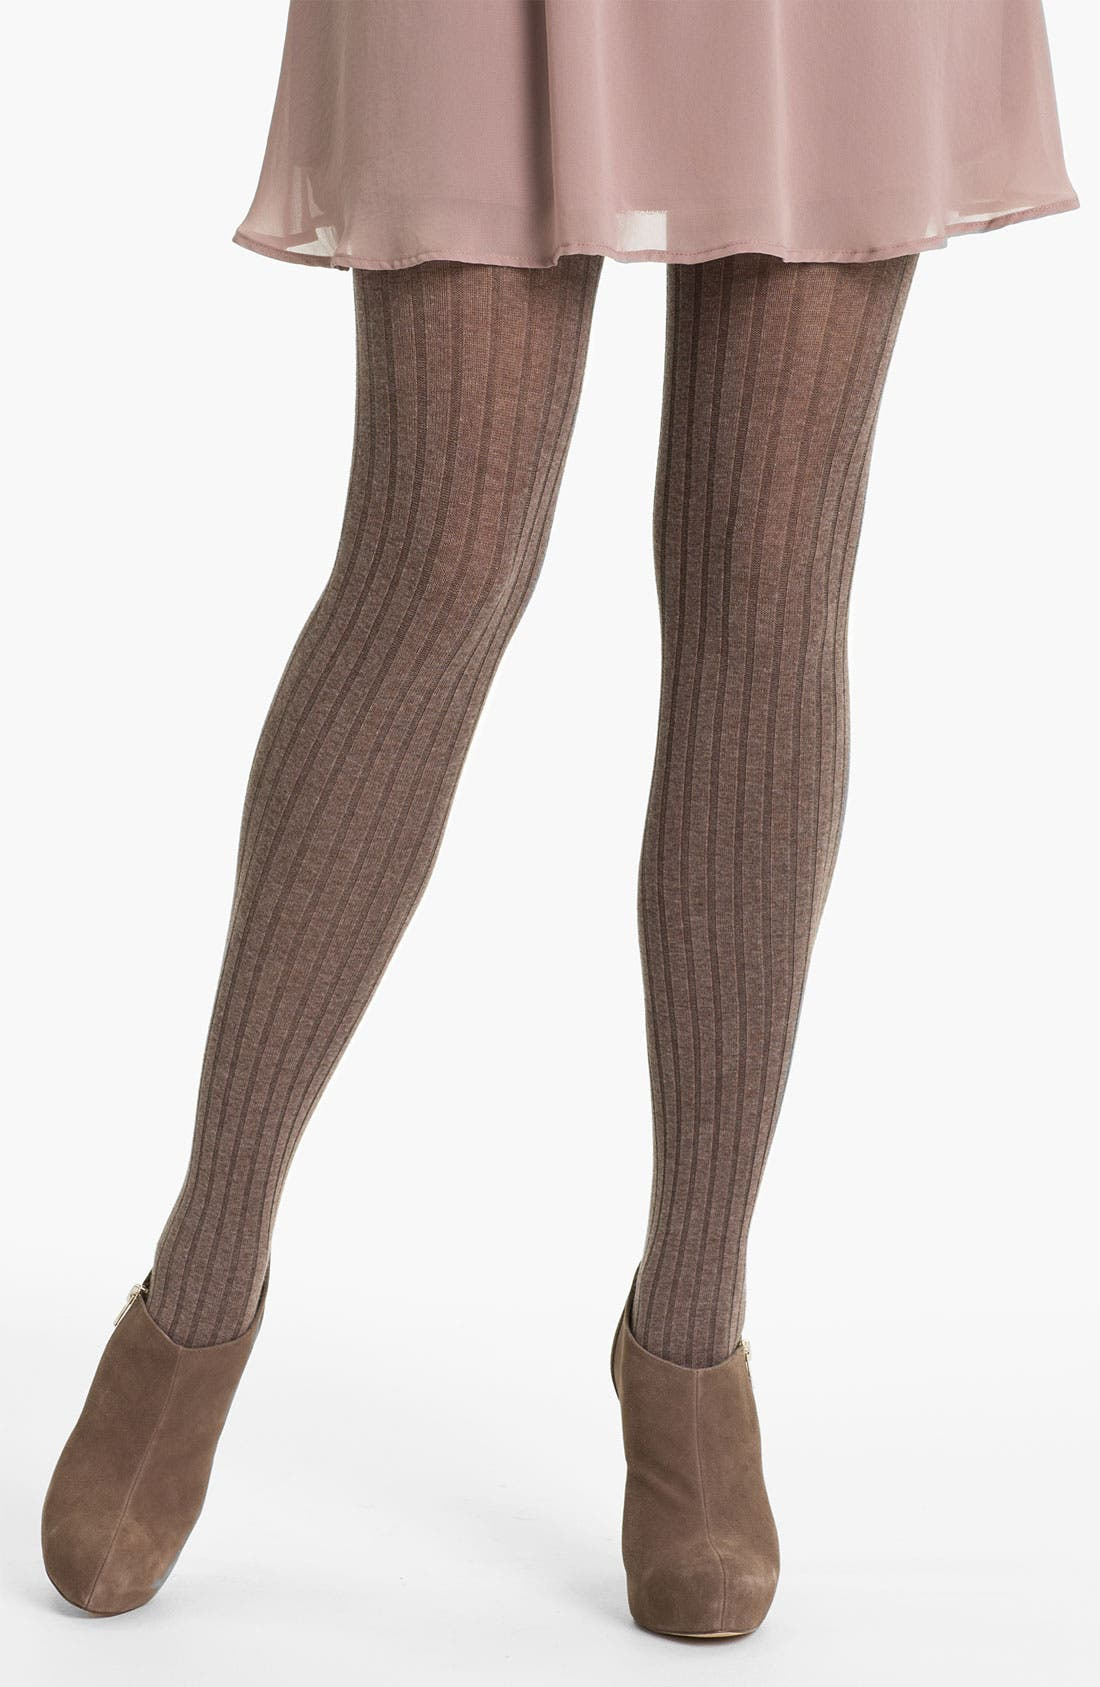 Main Image - Oroblu 'Angela' Ribbed Cotton Tights